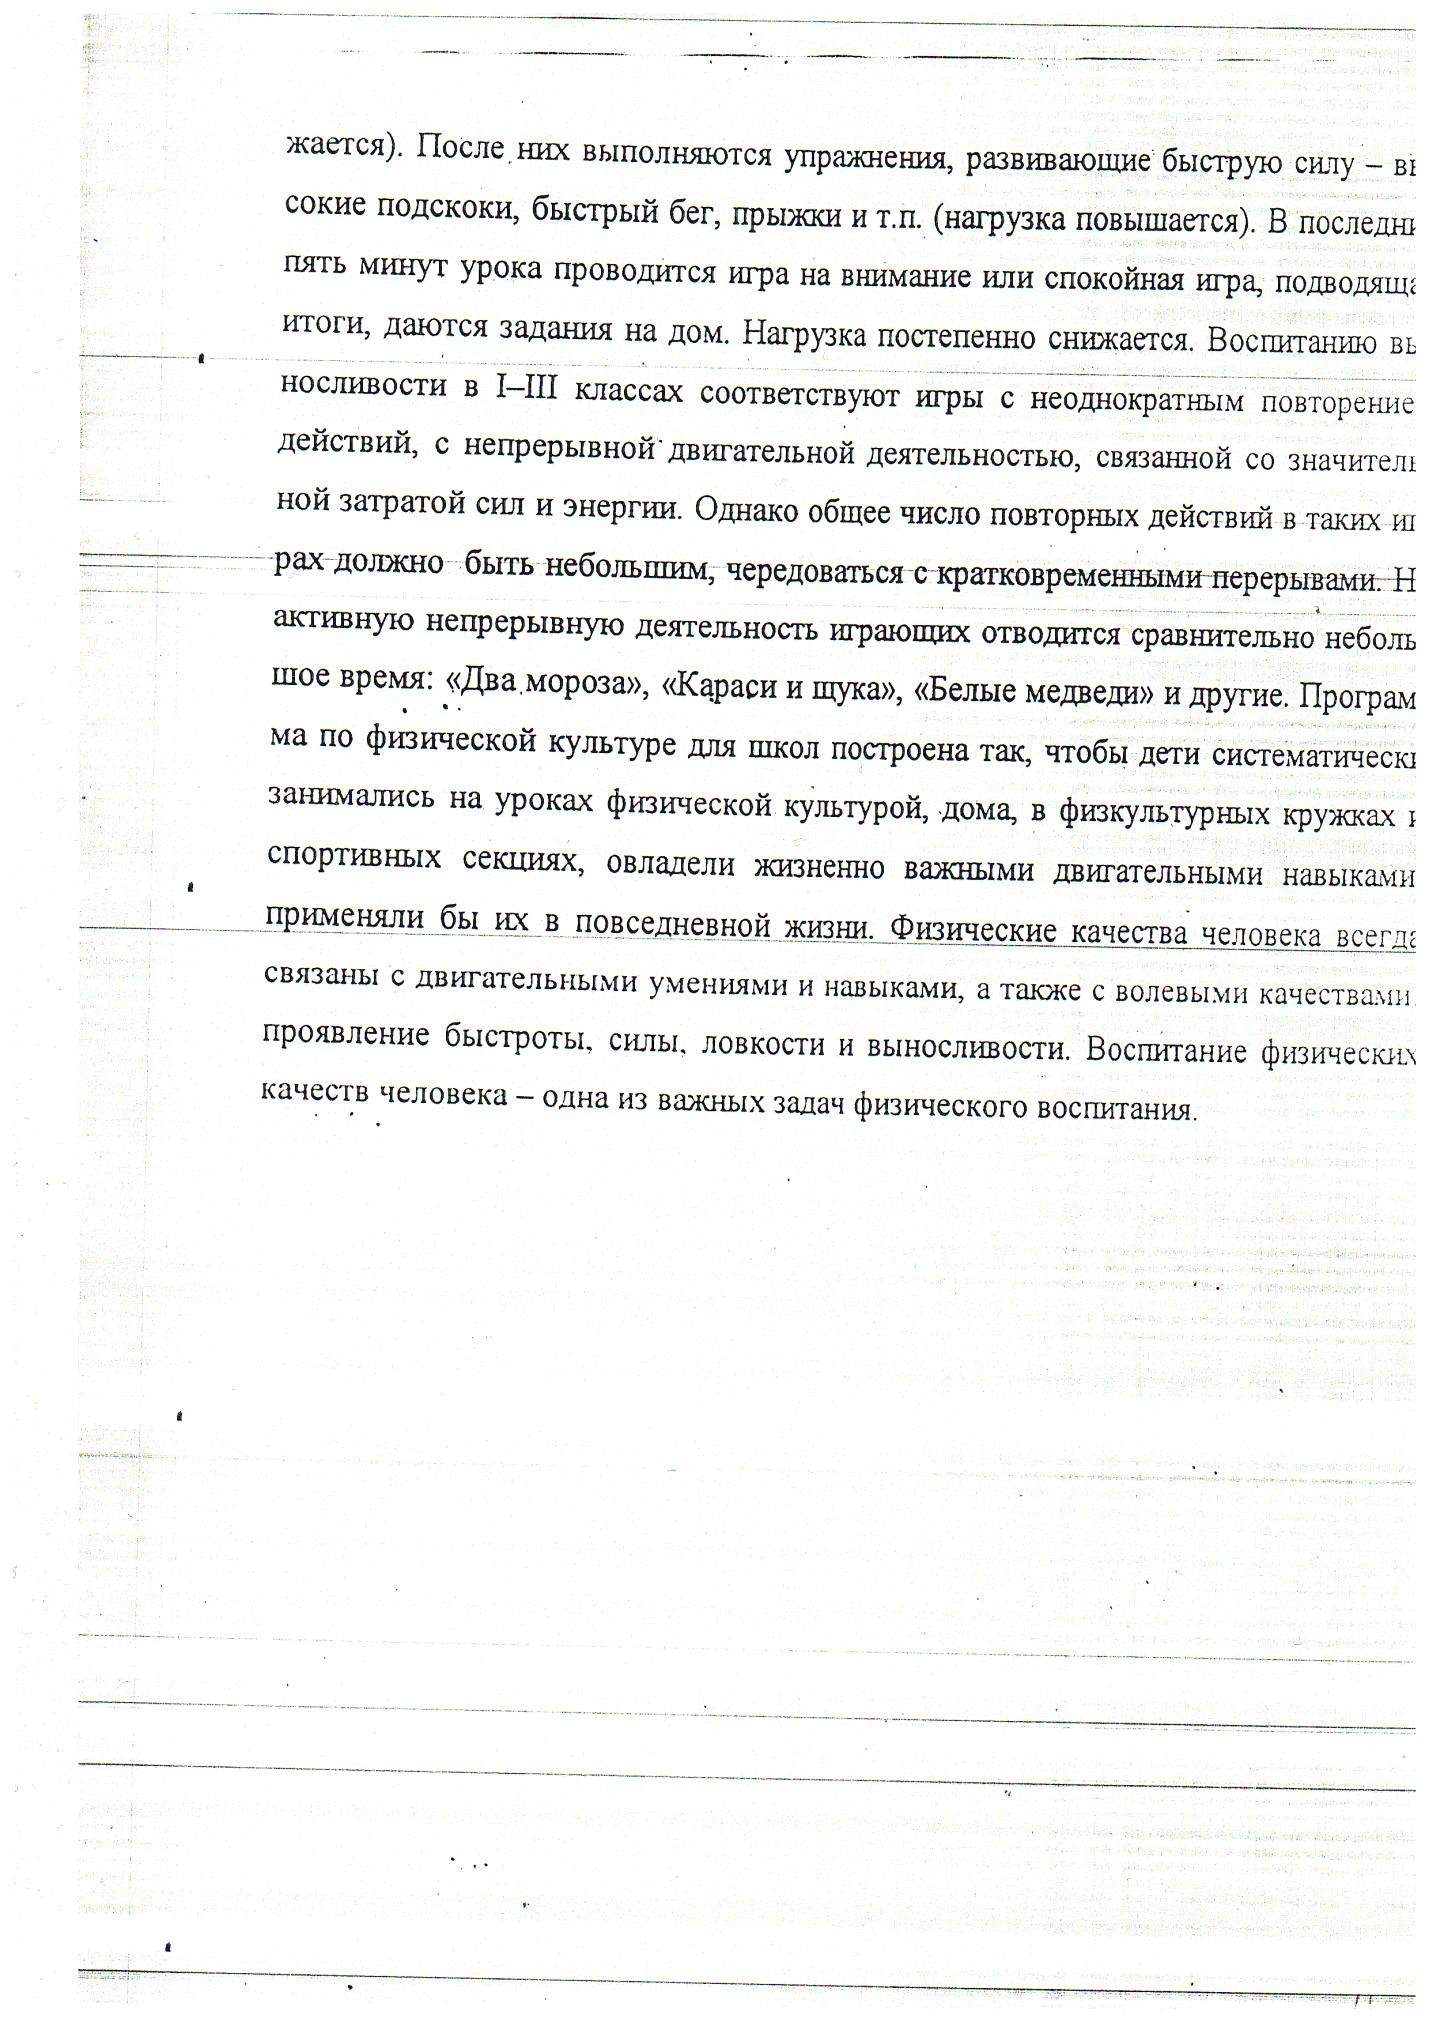 C:\Users\Татьяна\Desktop\16 001.BMP